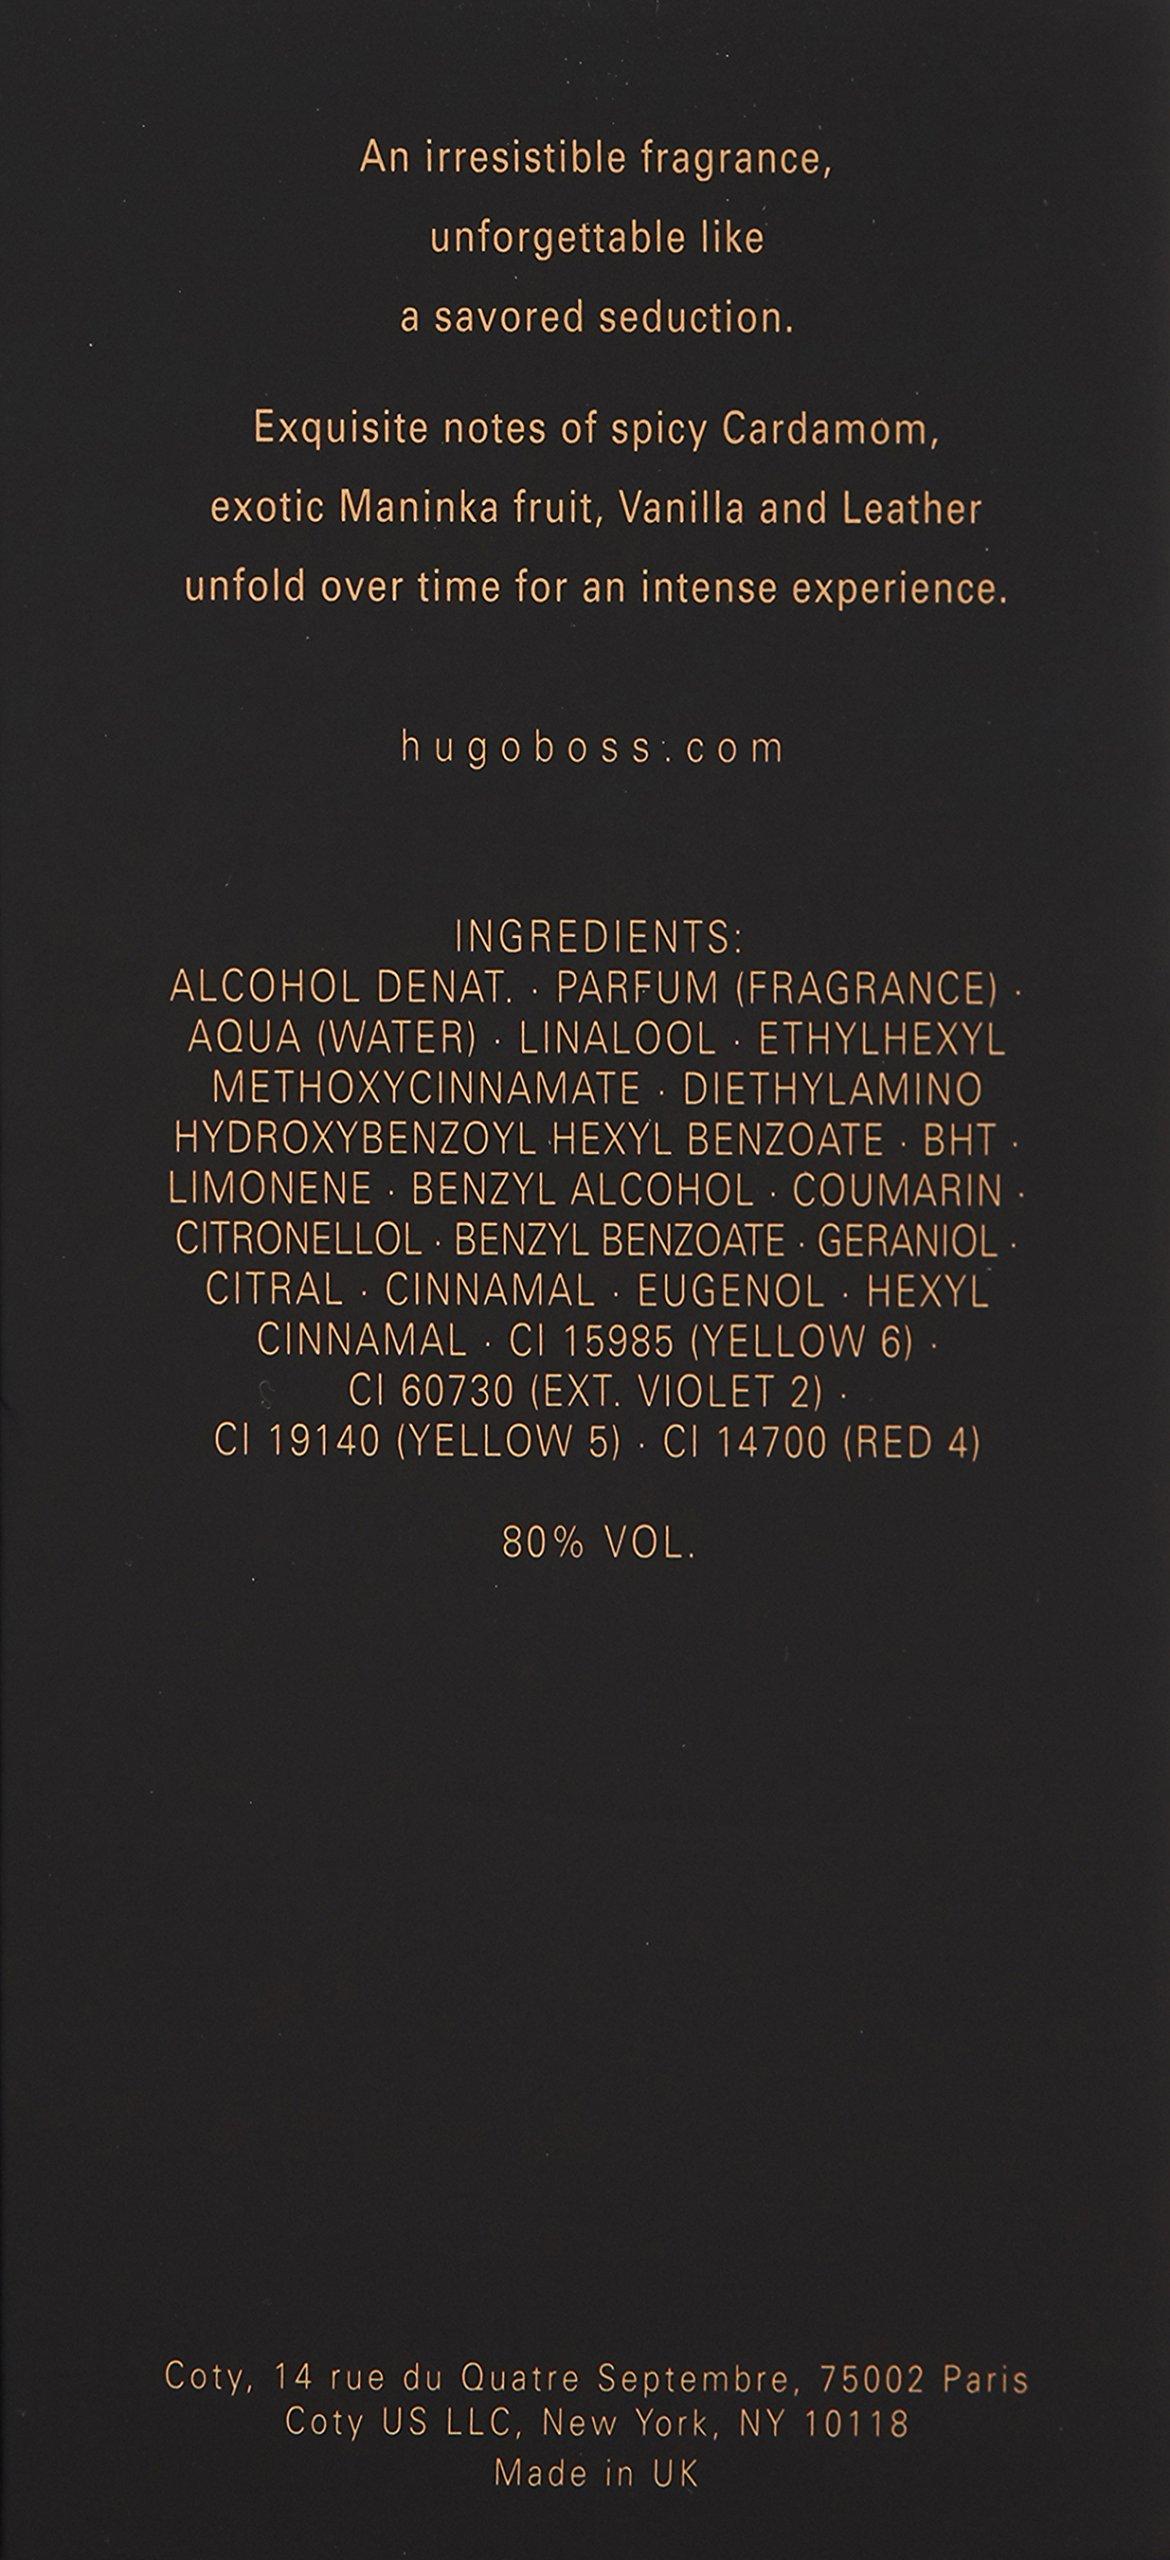 Hugo Boss THE SCENT INTENSE Eau de Parfum, 3.3 Fl Oz by Hugo Boss (Image #2)